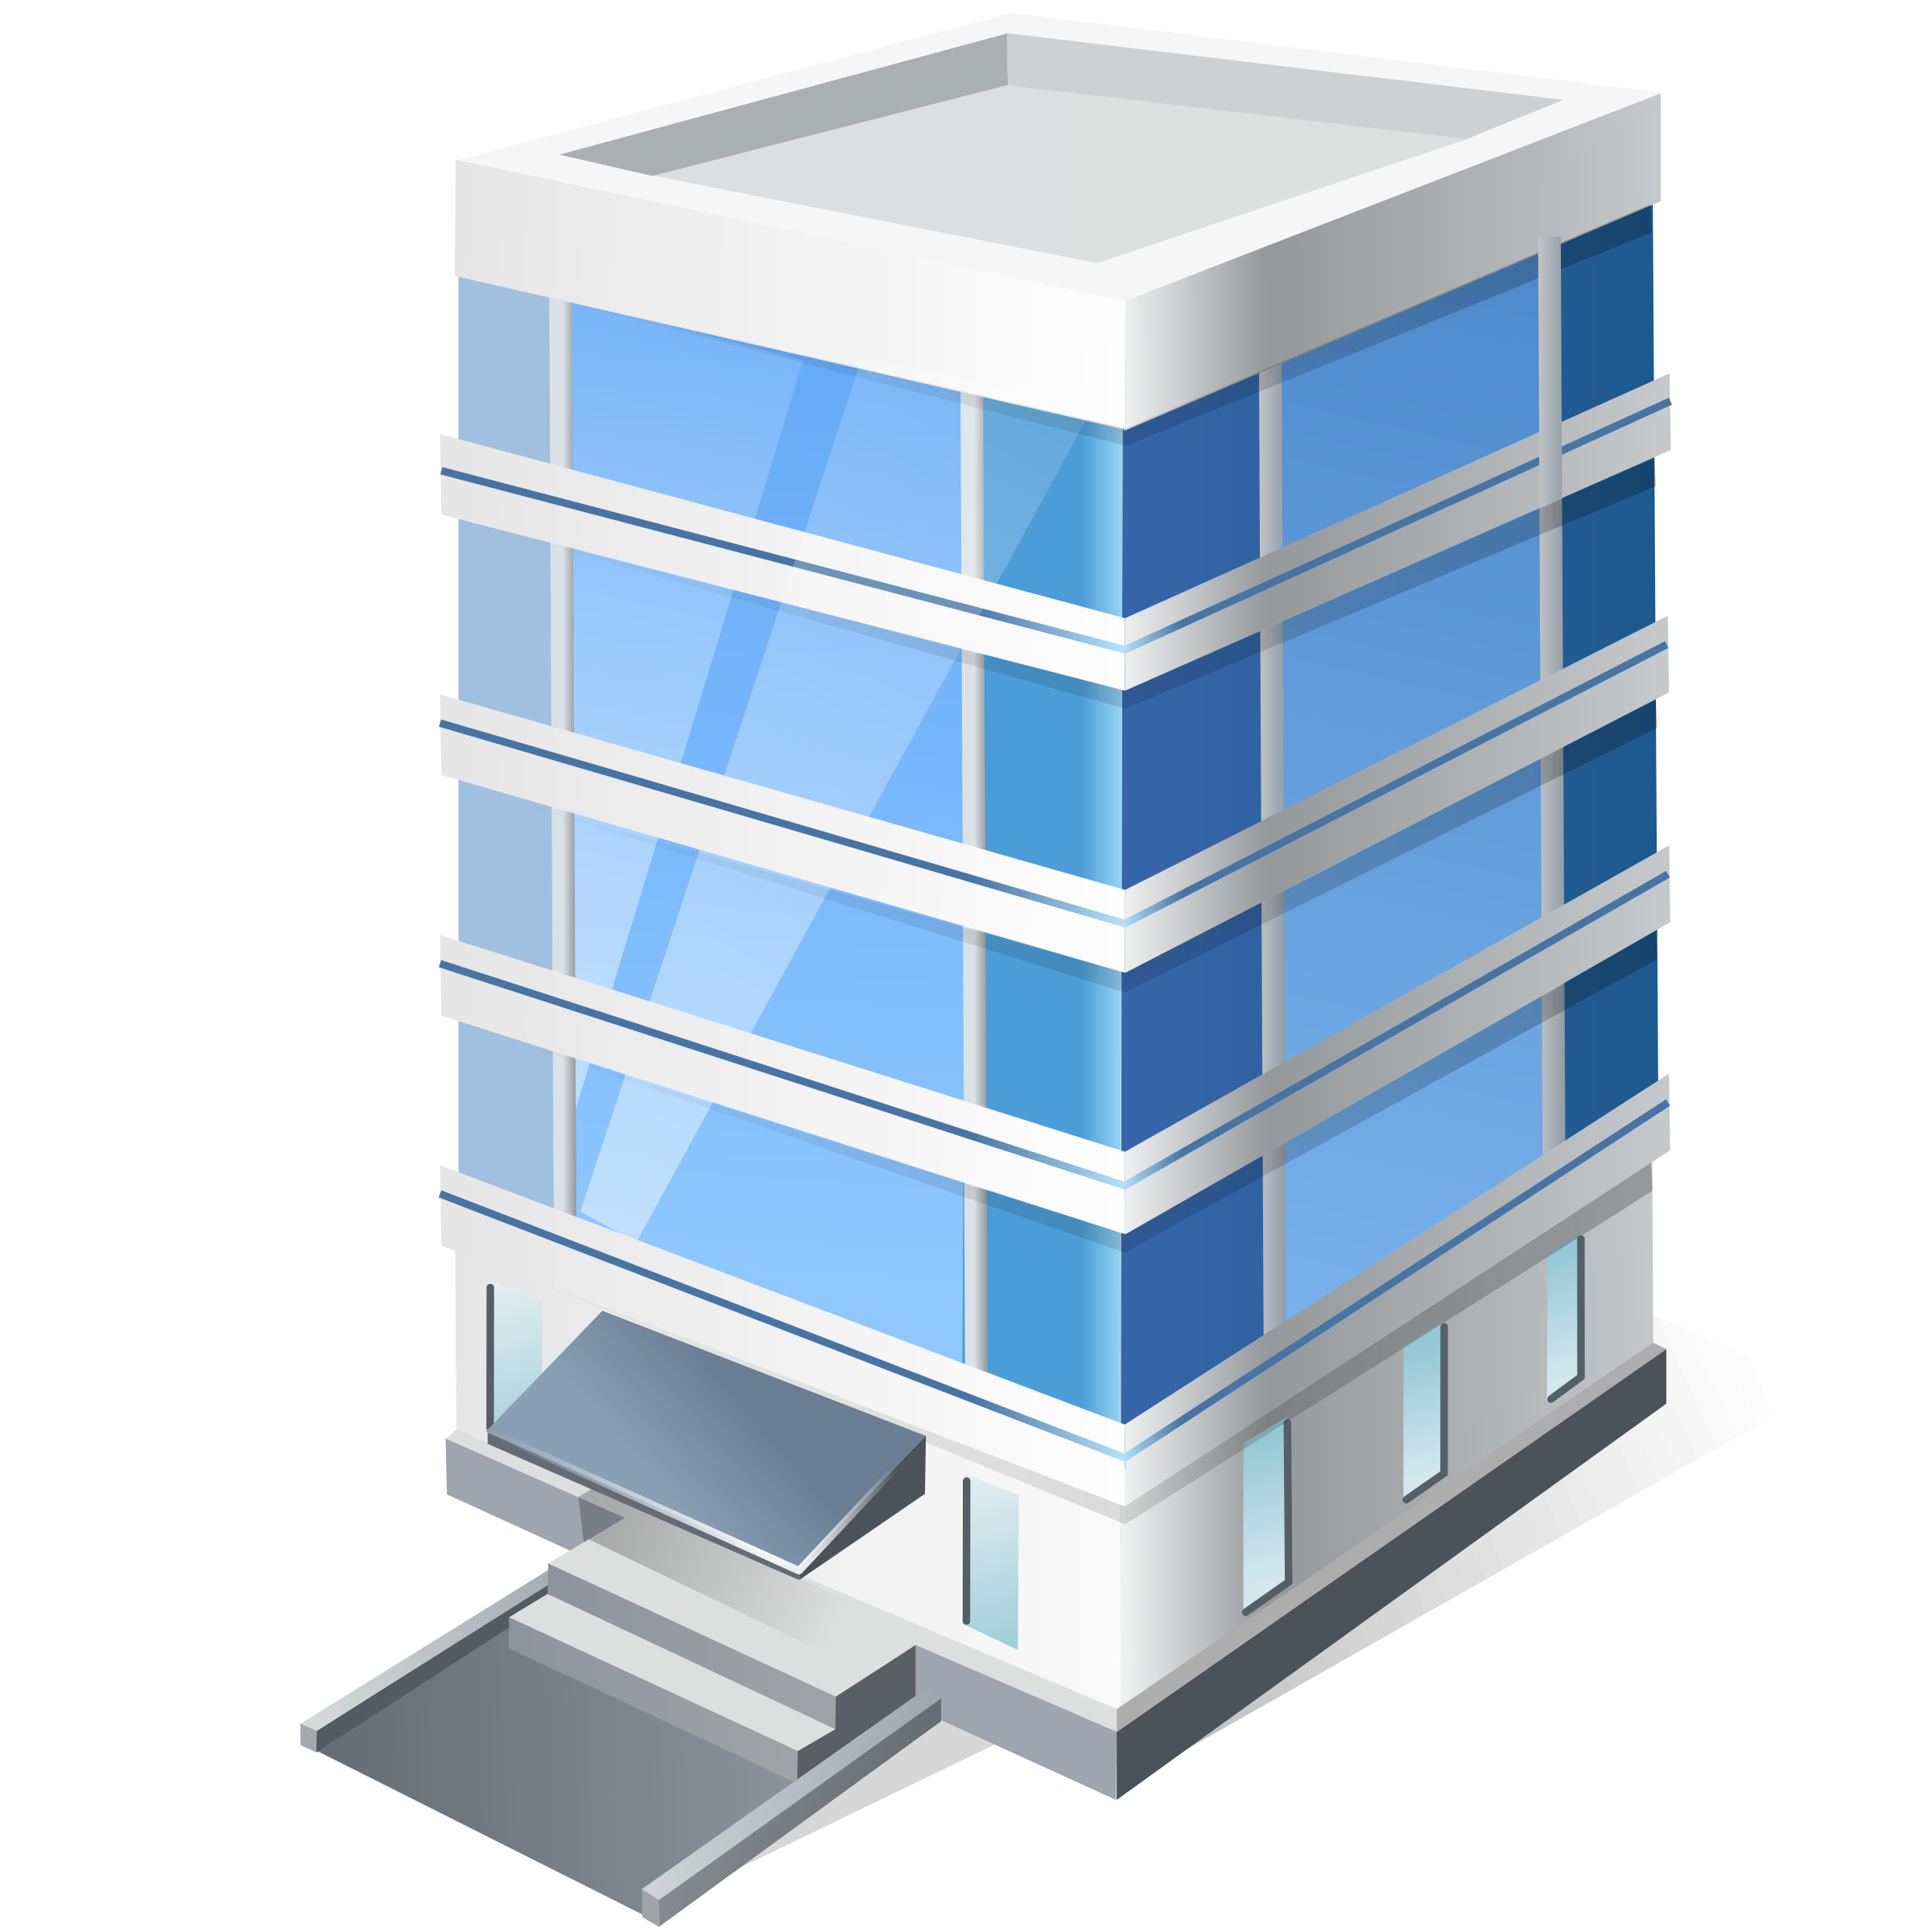 Free clip art buildings